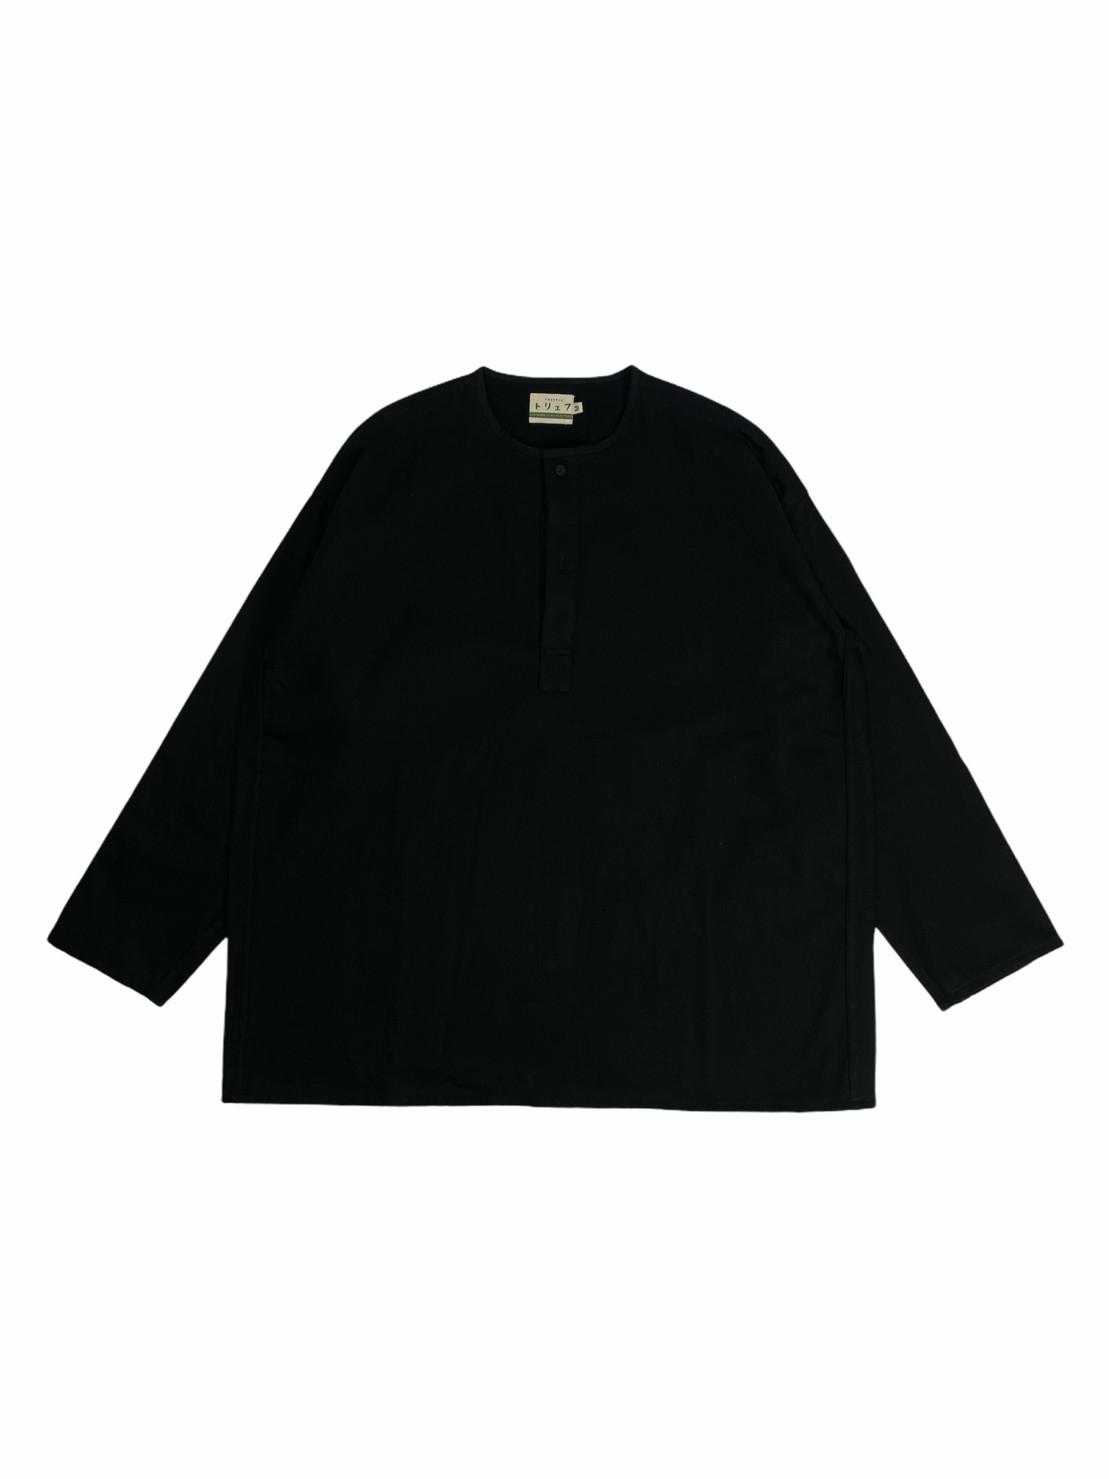 Relax Shirt (Black)